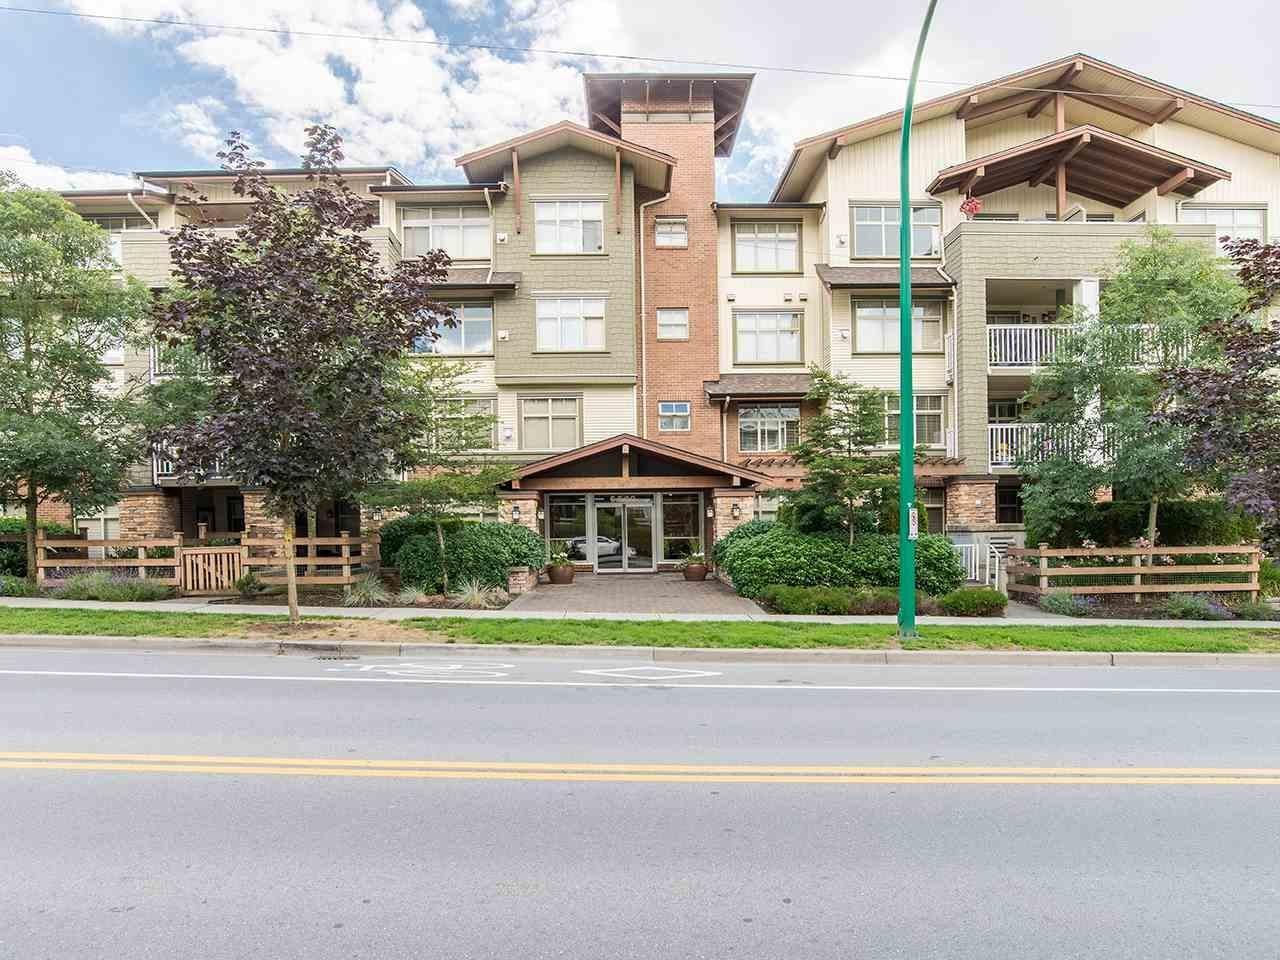 R2081025 - 307 6500 194 STREET, Clayton, Surrey, BC - Apartment Unit